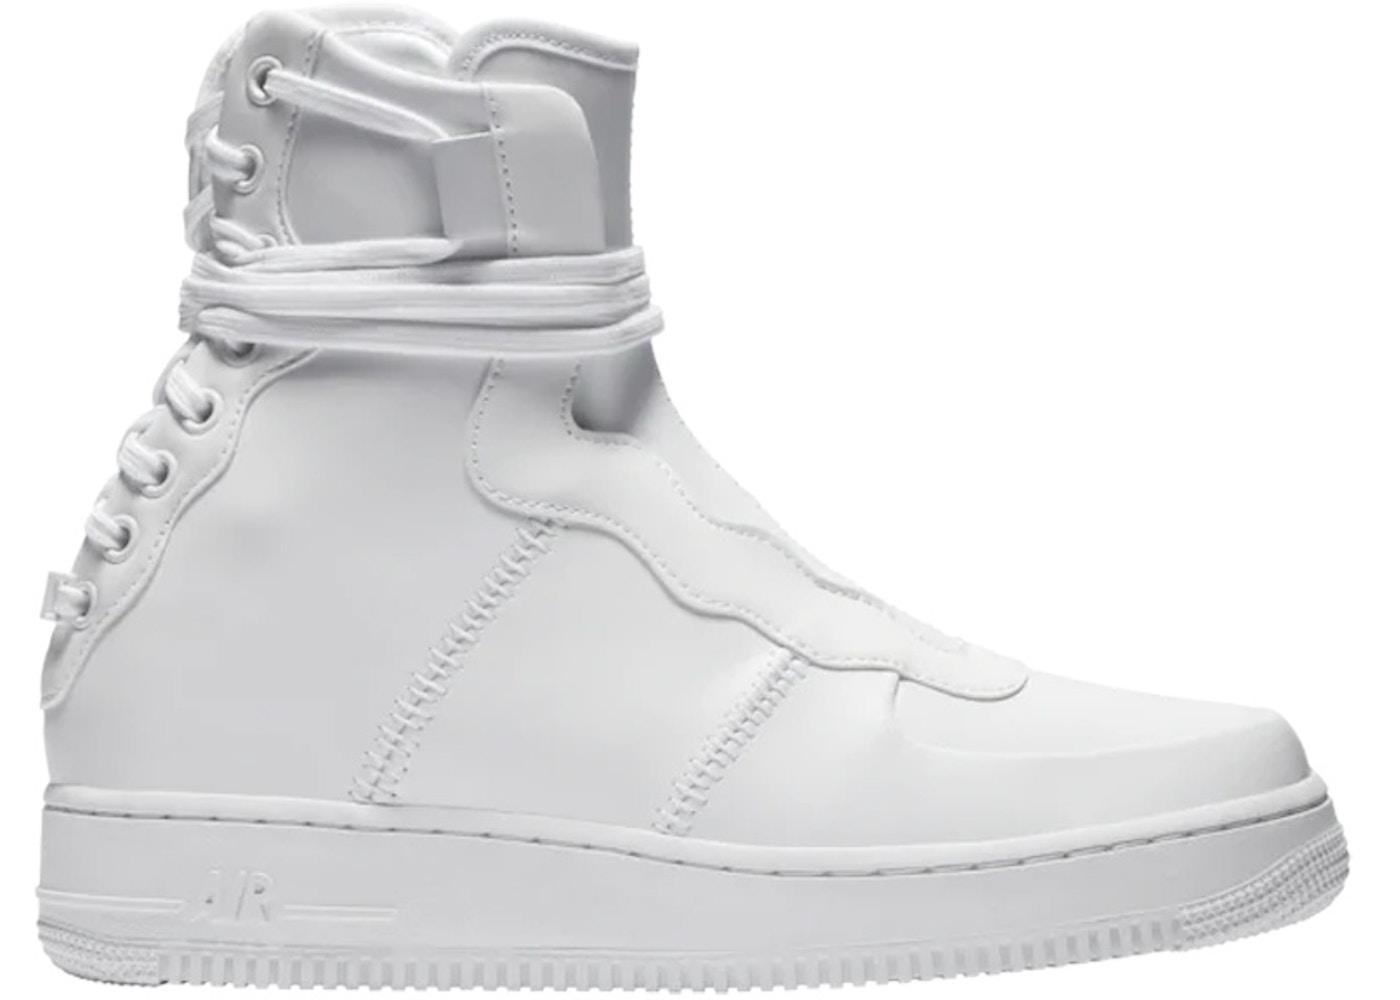 Prominente Herméticamente Privilegio  Nike Air Force 1 Rebel XX White (W) - AO1525-101